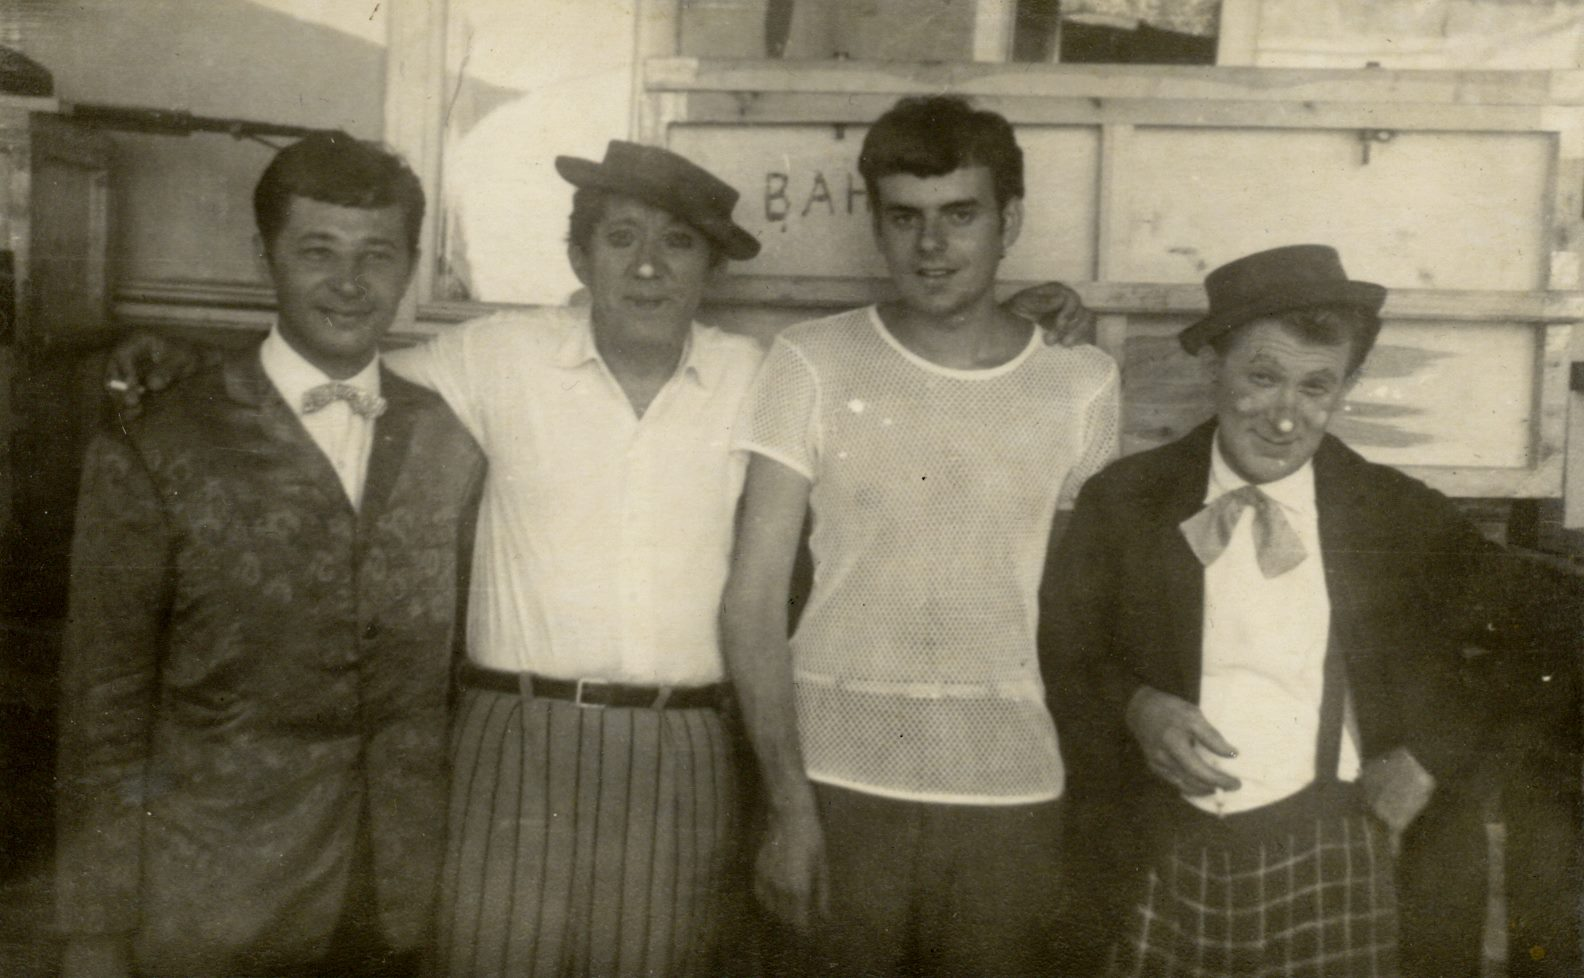 Слева направо: неизвестно, Юрий Никулин, Александр Татарский, Михаил Шуйдин